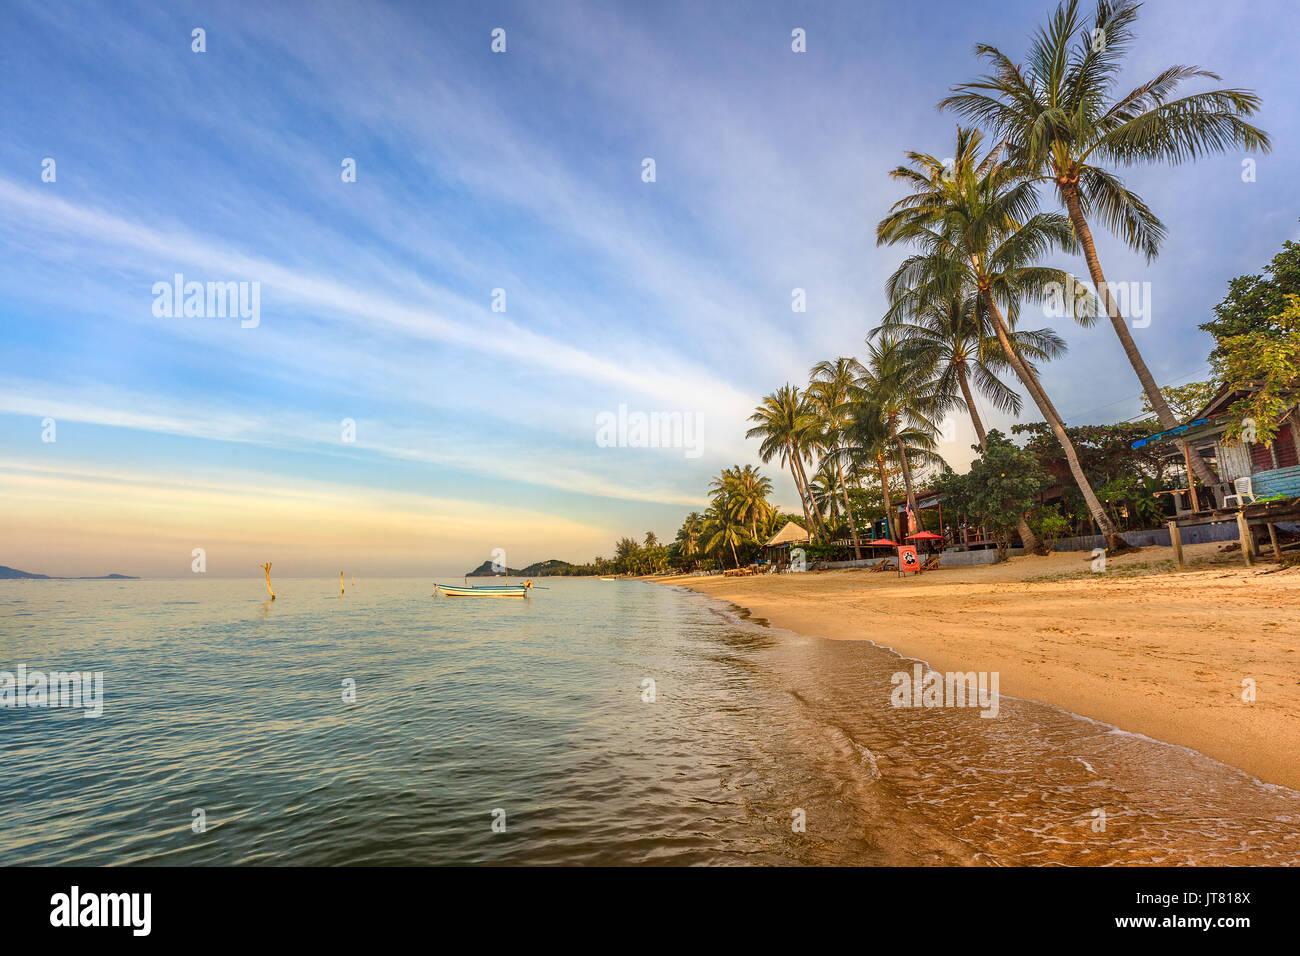 Bang Po Beach sunset in Koh Samui island, Thailand - Stock Image